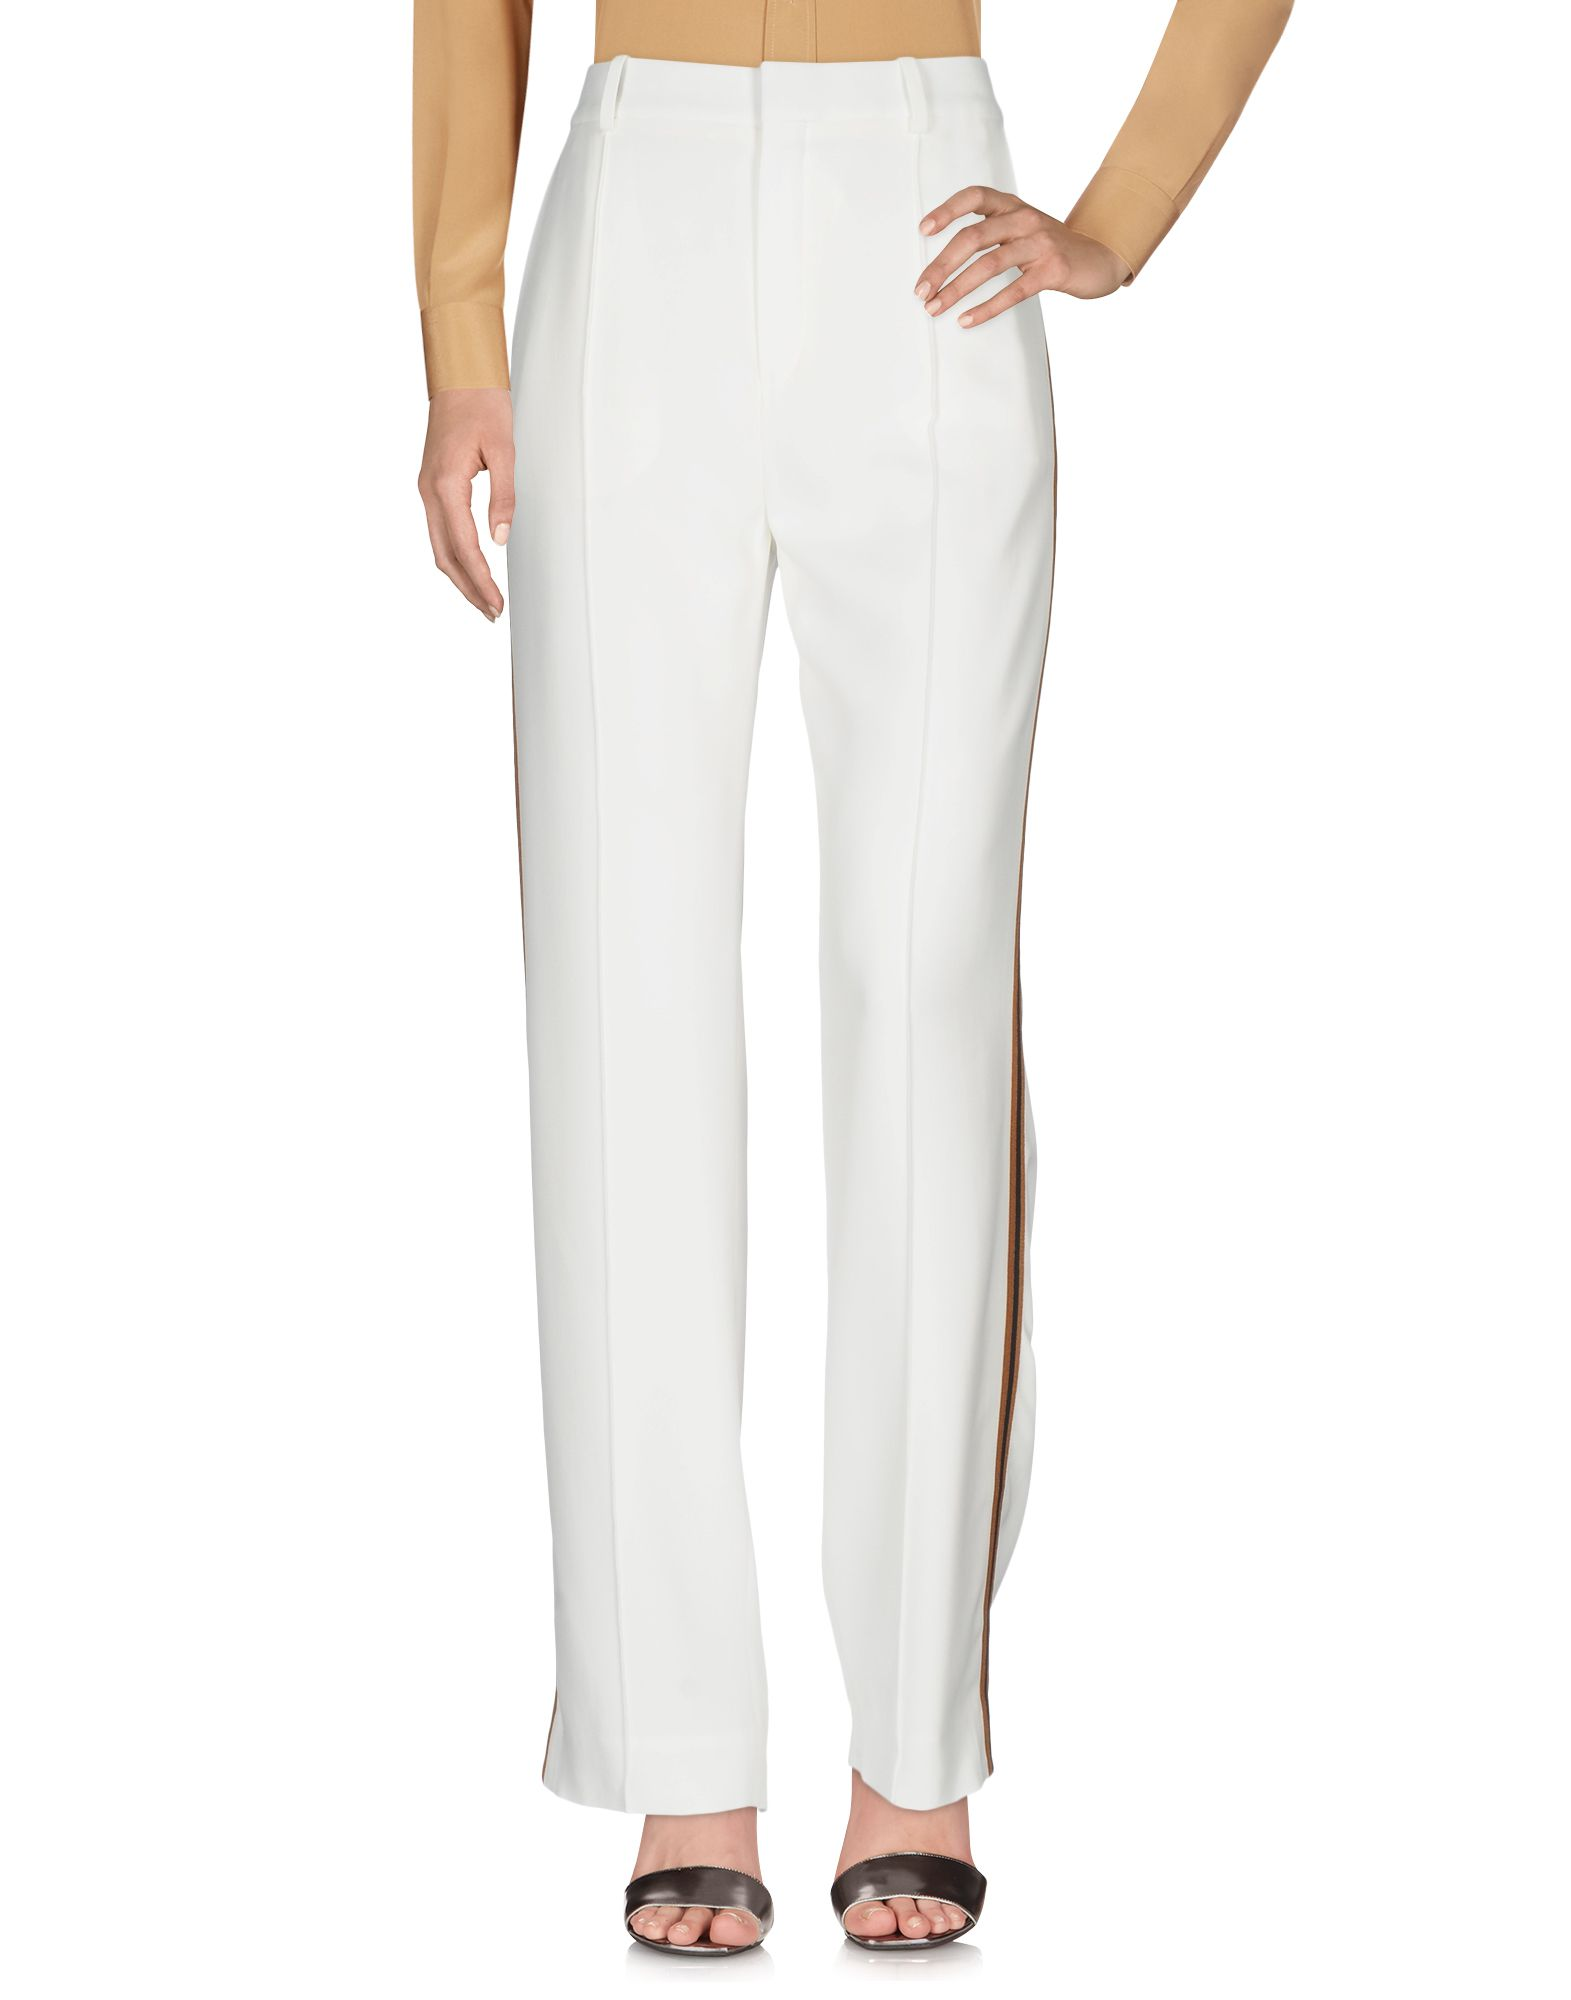 Pantalone Chloé Donna - Acquista online su hnxii3n2Ek